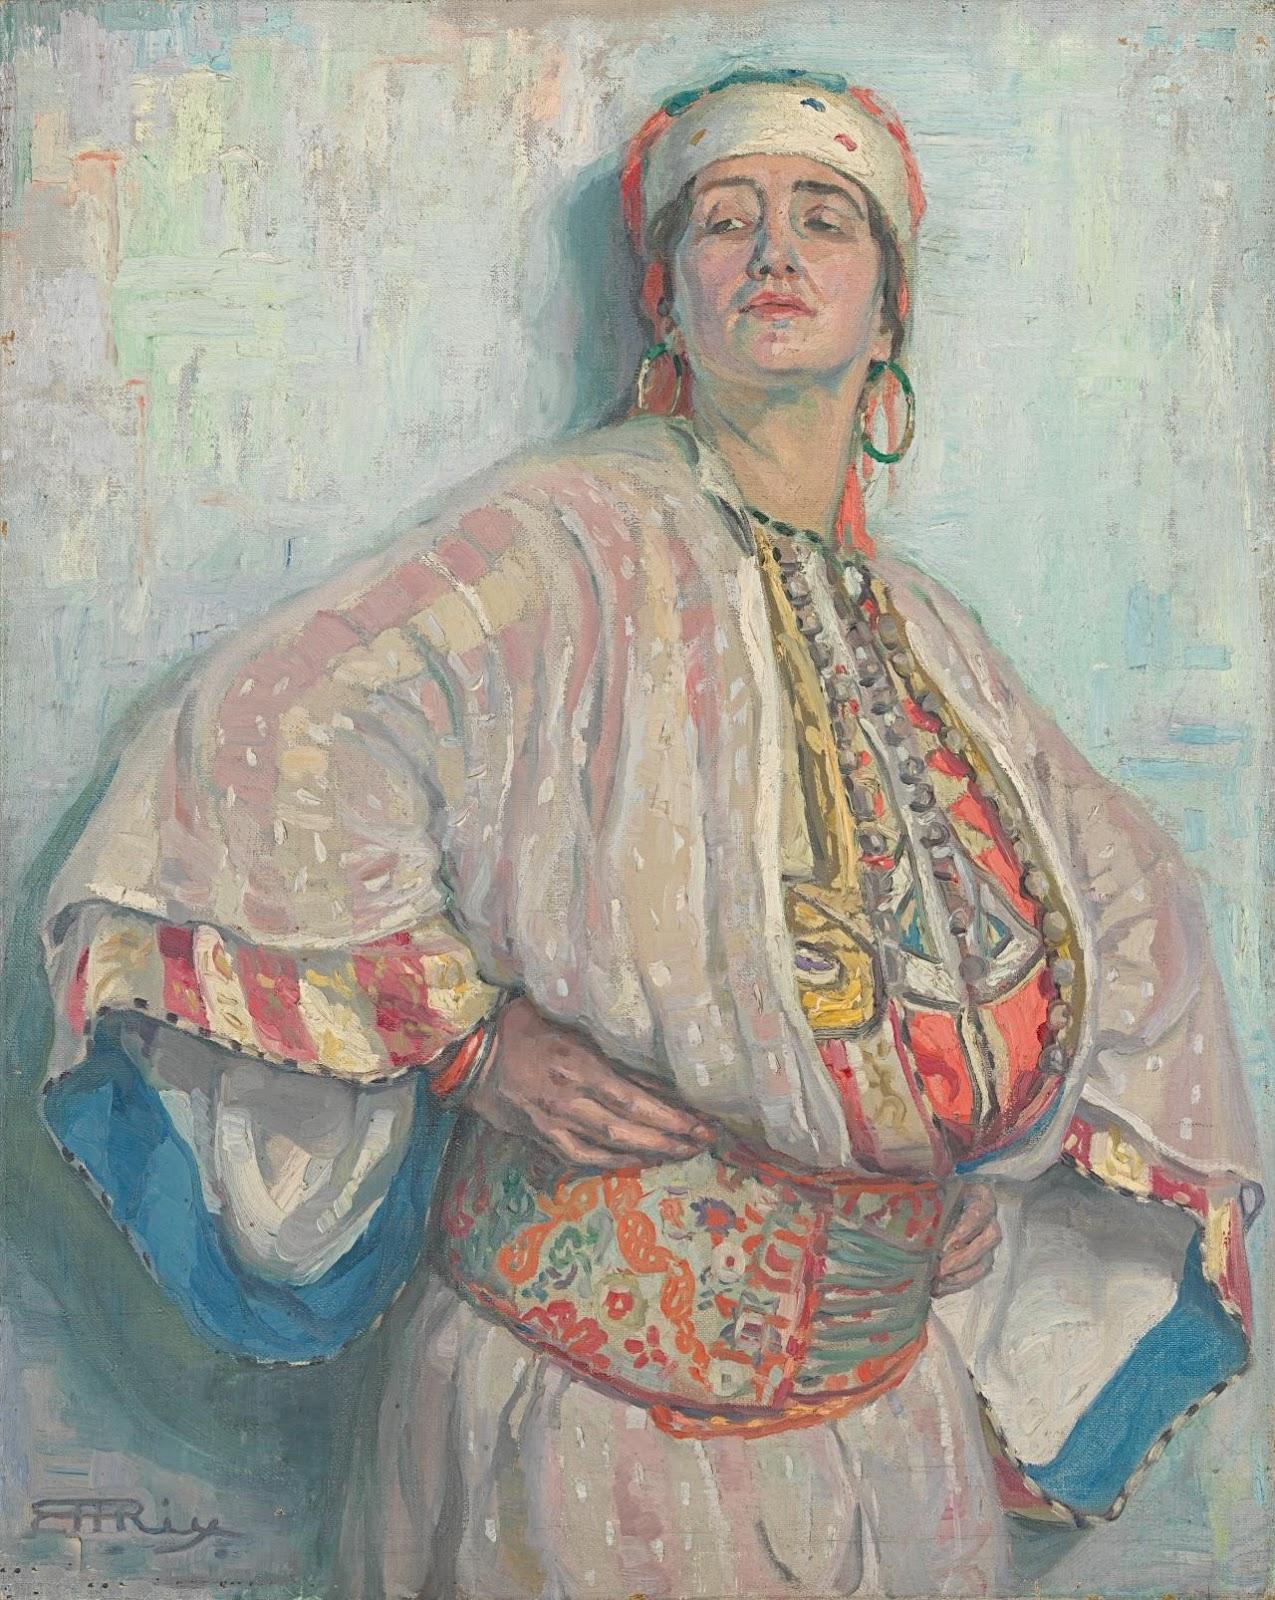 Hilda Rix Nicholas Defiance National Gallery of Australia